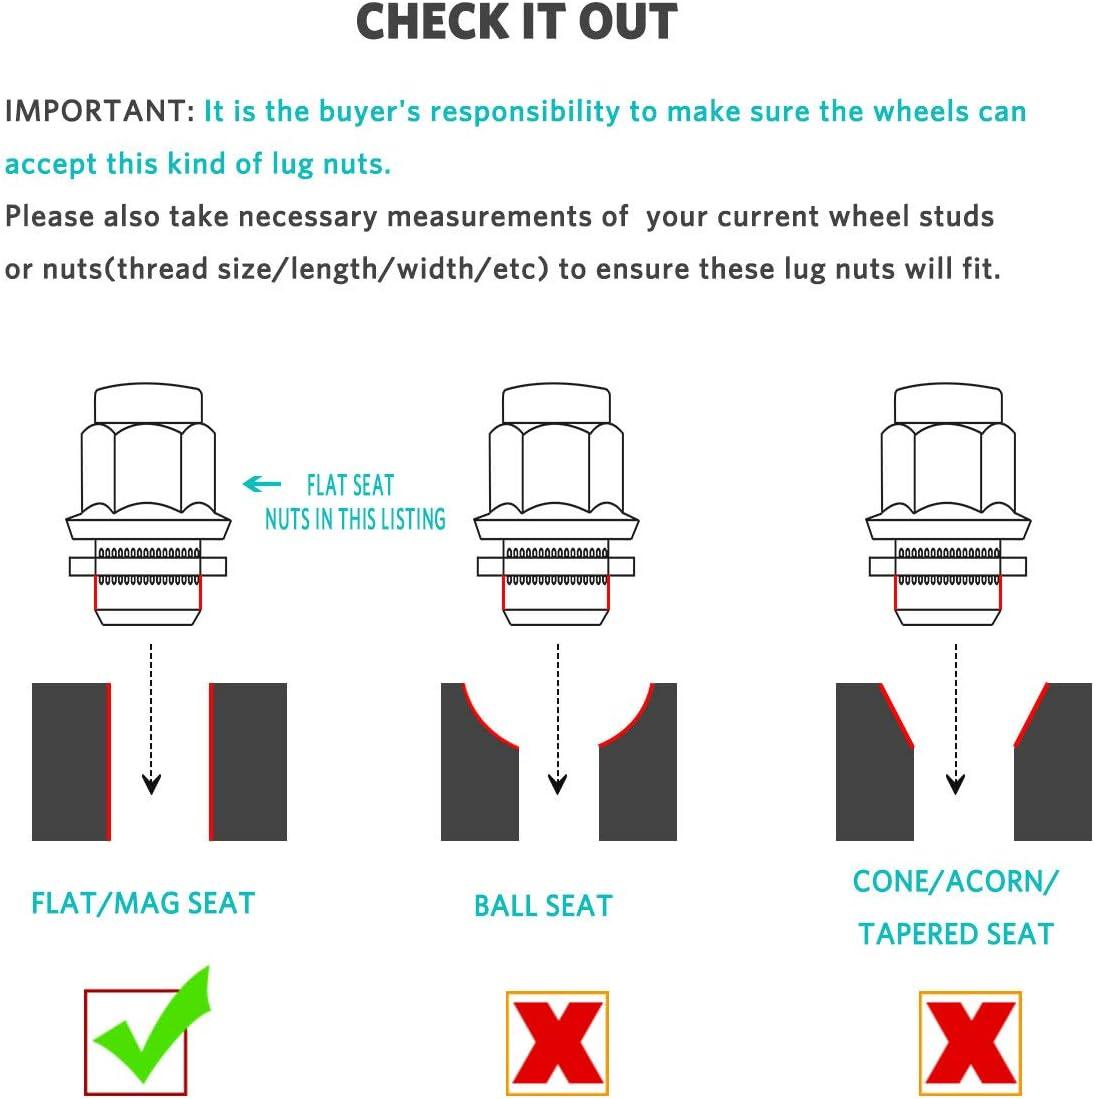 Maxiii Lug Nuts 14x1.5 20PCS Chrome Mag Seat Compatible for Lexus LS460 LS600h LX570 Toyota Land Cruiser Sequoia Tundra